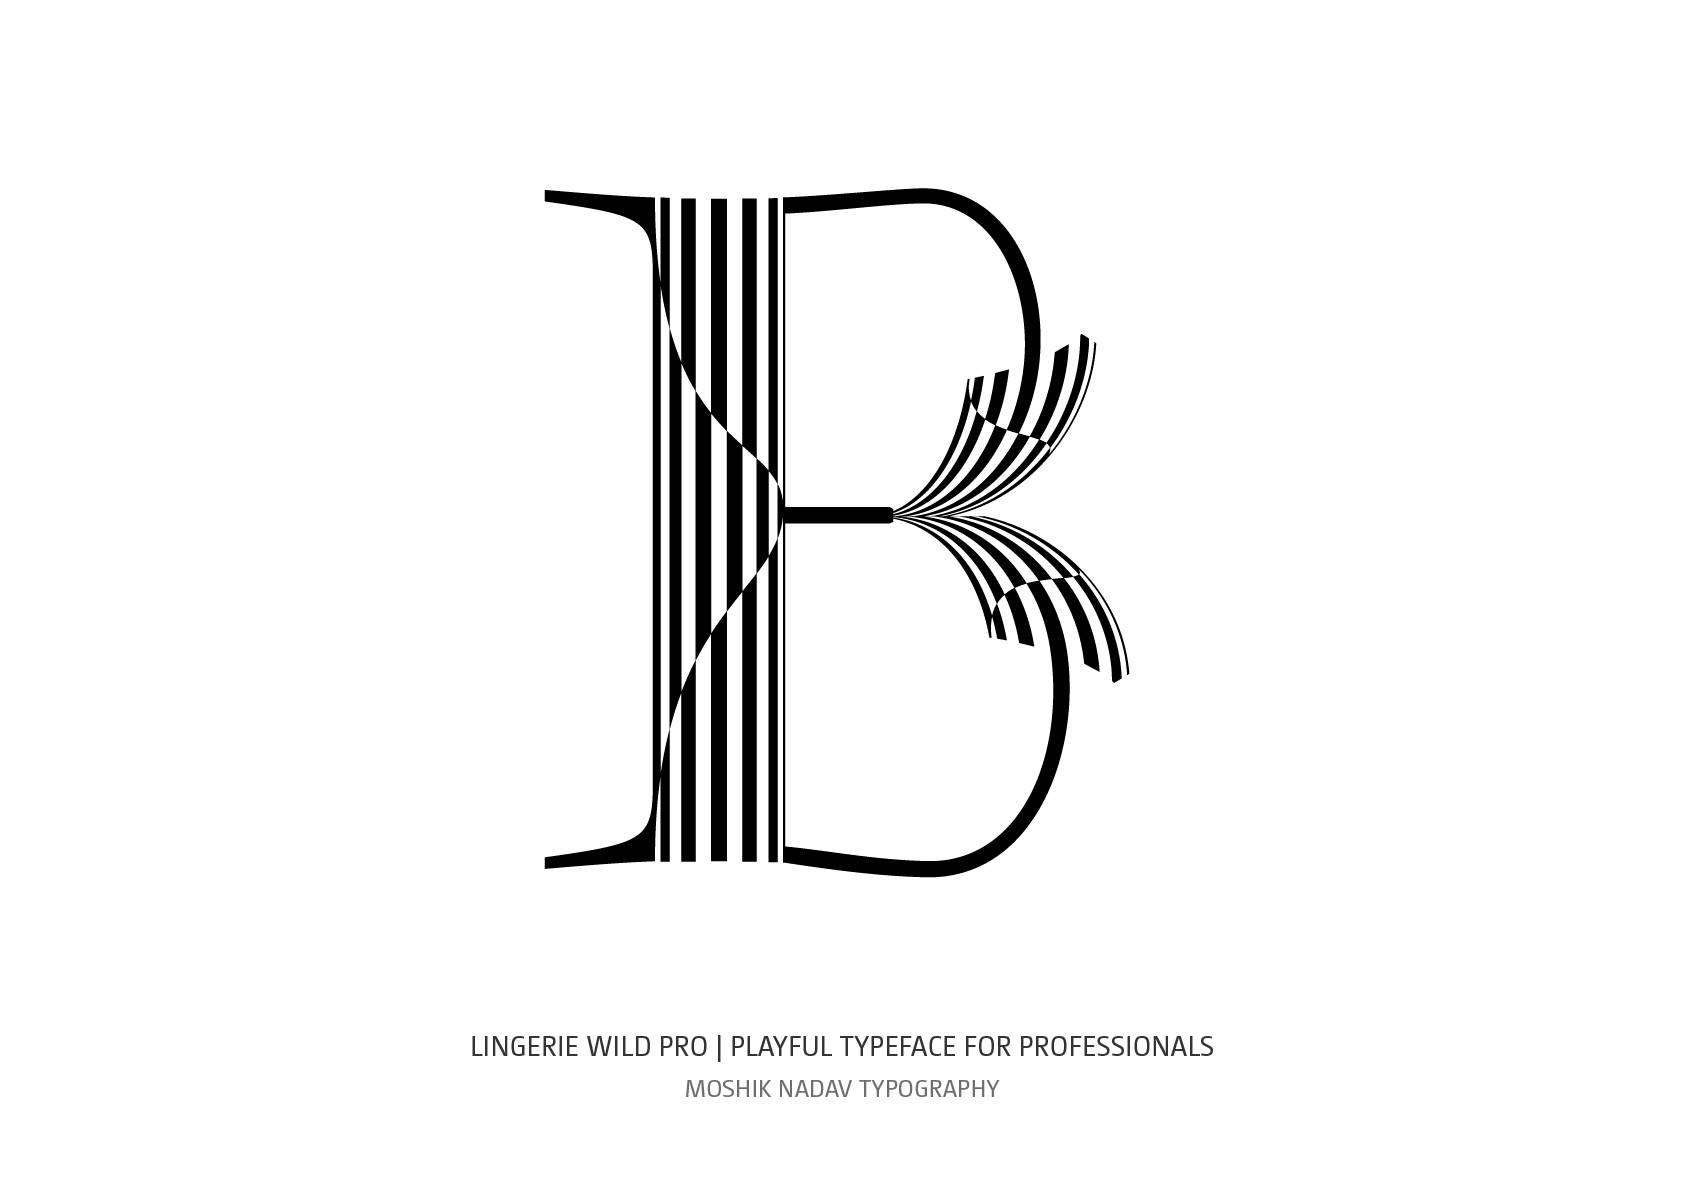 Lingerie Wild Pro Typeface Chimera X style by Moshik Nadav